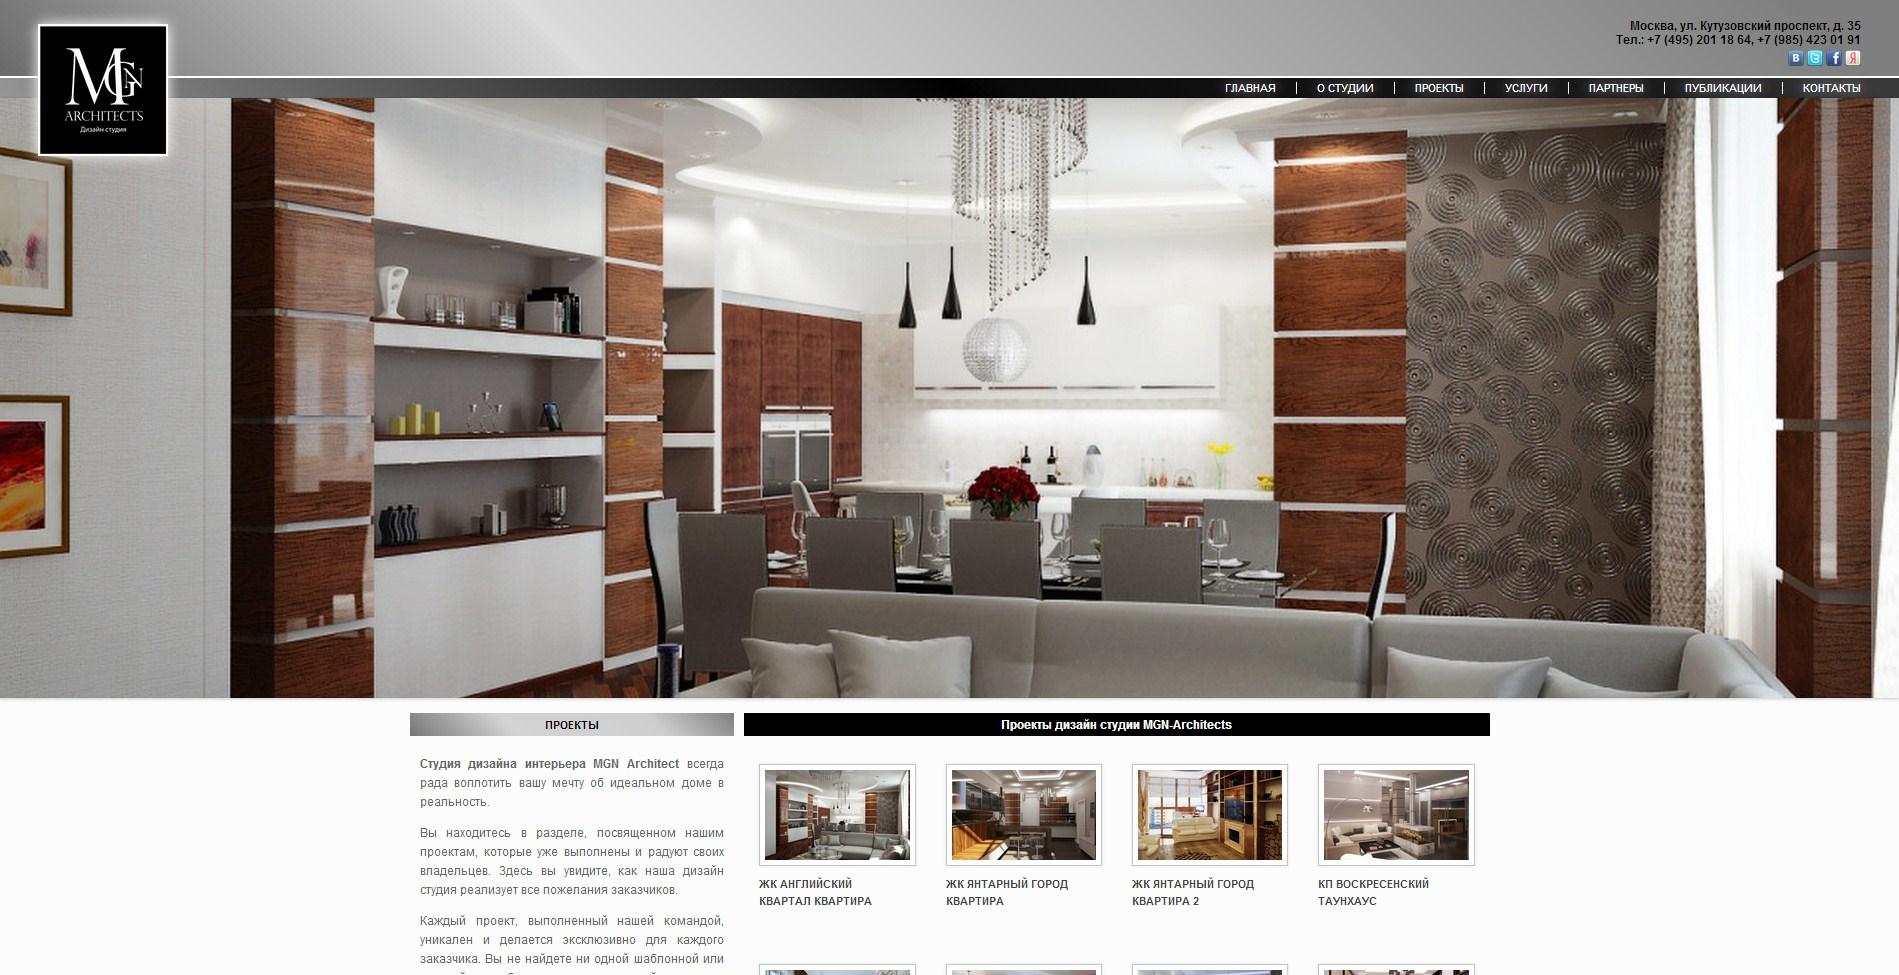 mgn-architect.ru